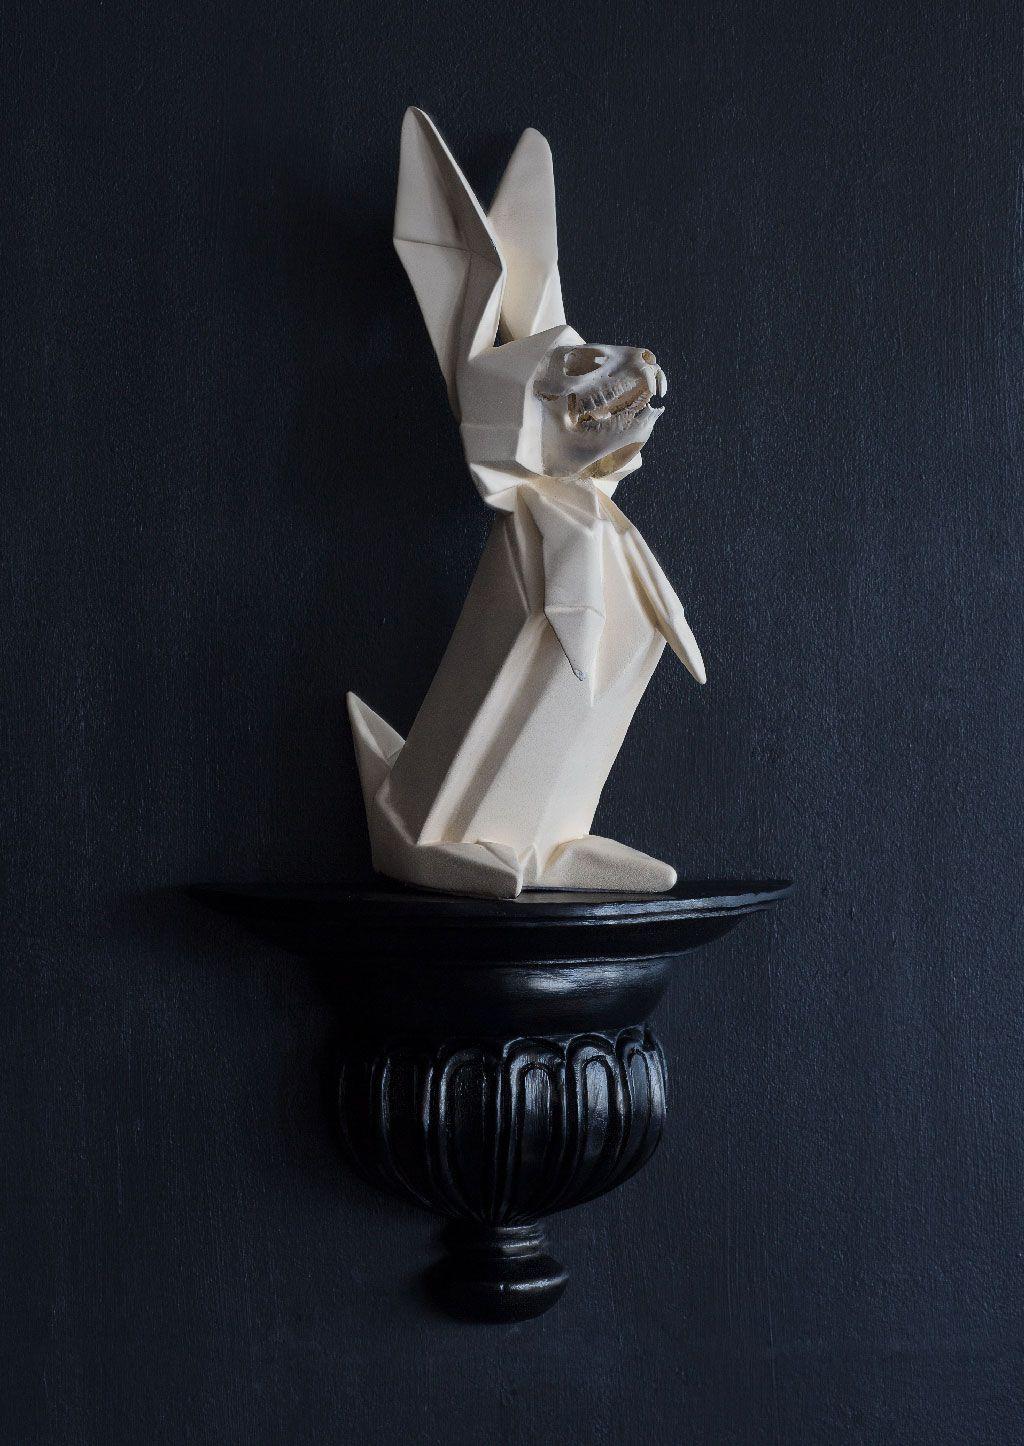 Jaisen Yates: Origami Death Hare, 2010, resine, bone, 37 x 12 x 10 cm